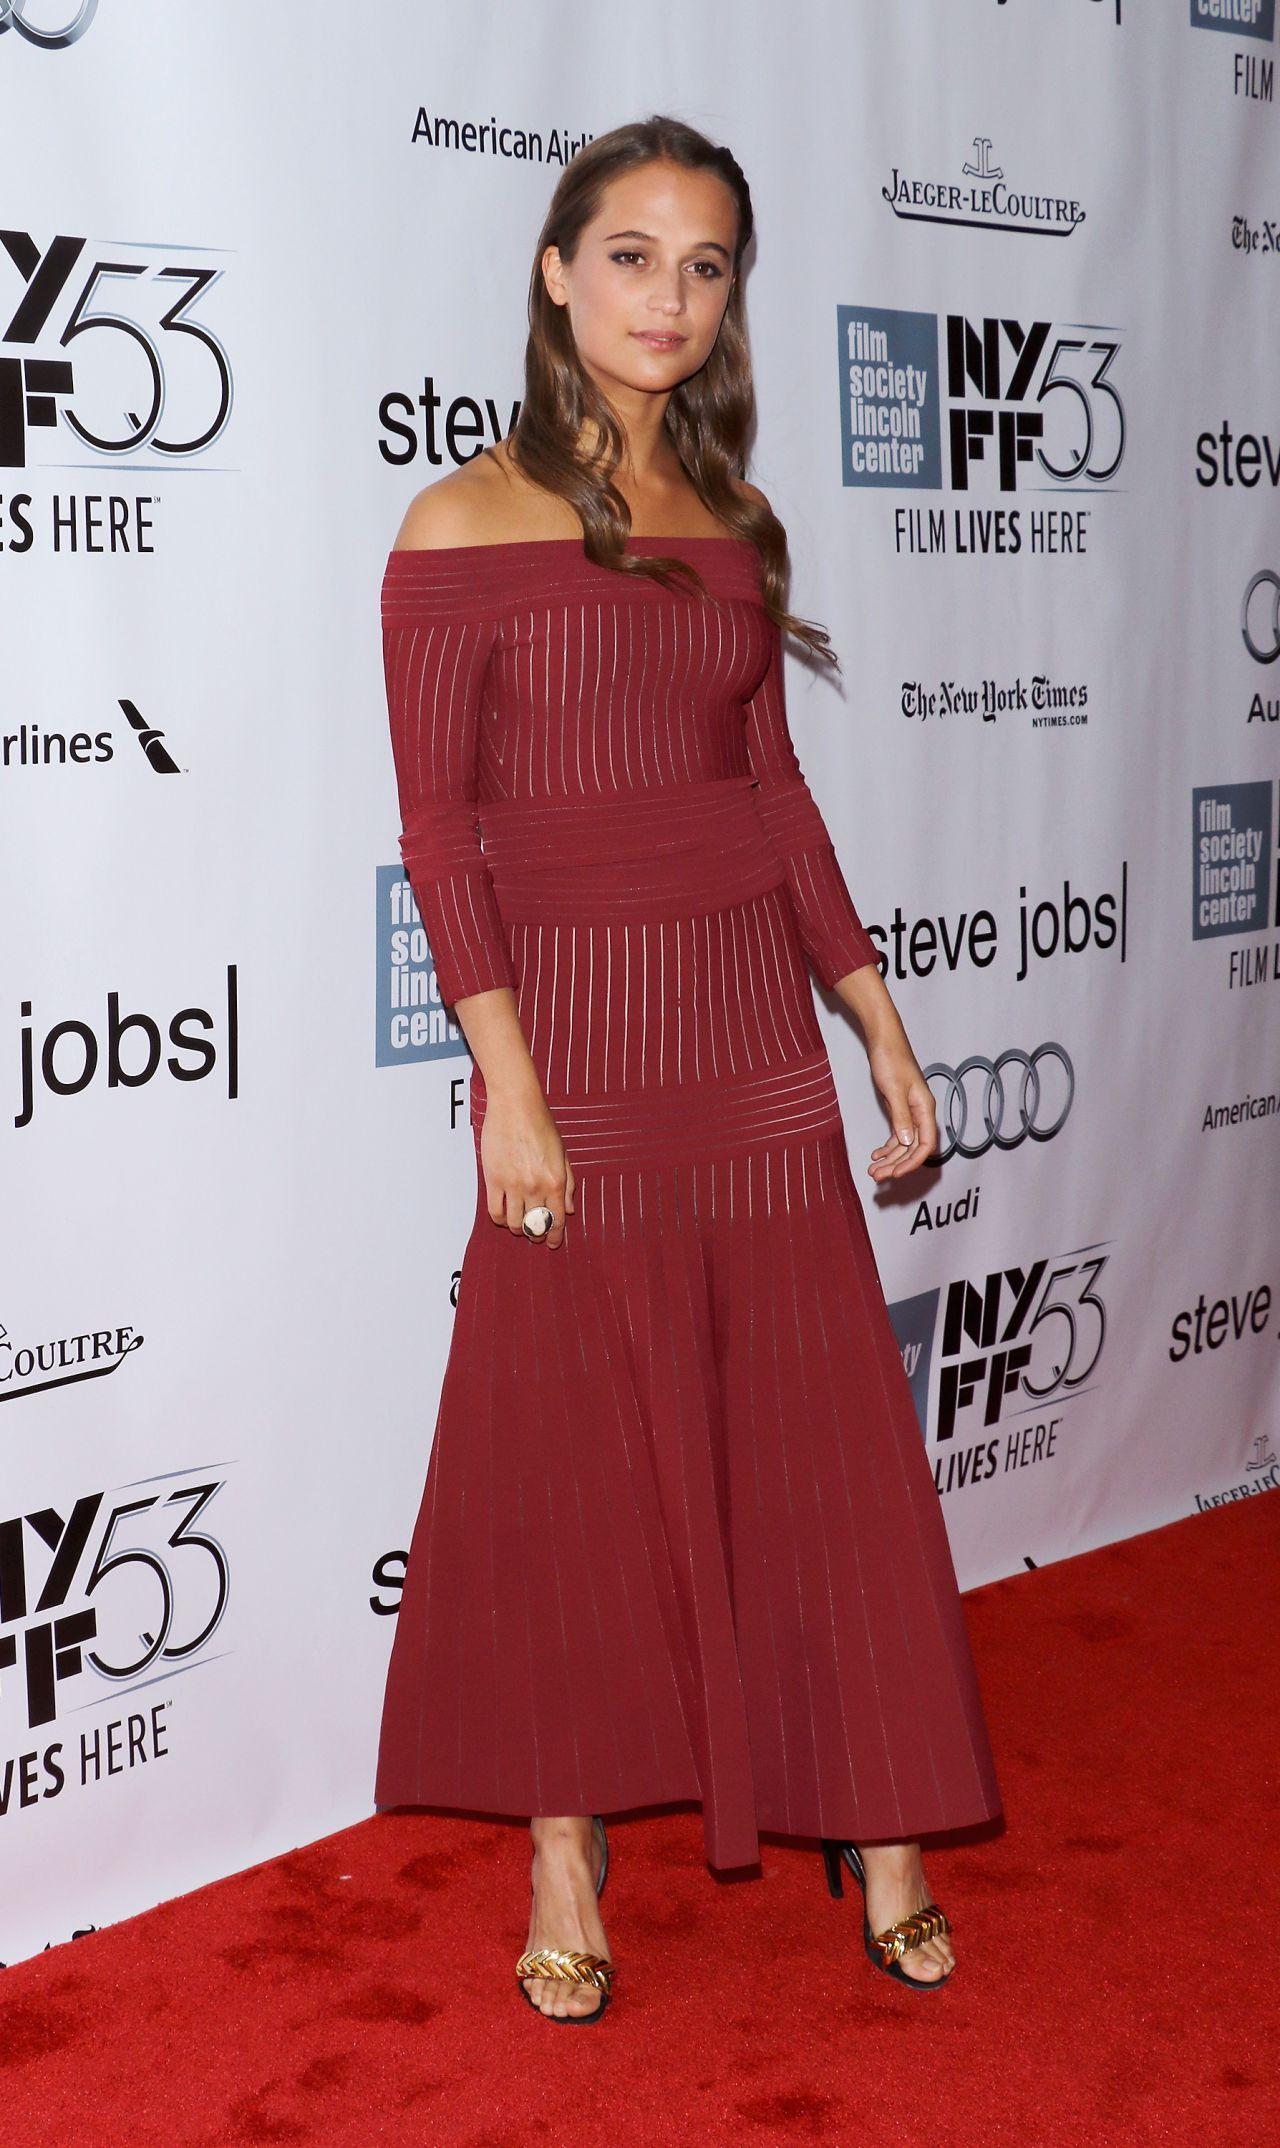 alicia-vikander-steve-jobs-premiere-at-nyff-in-new-york-city_3